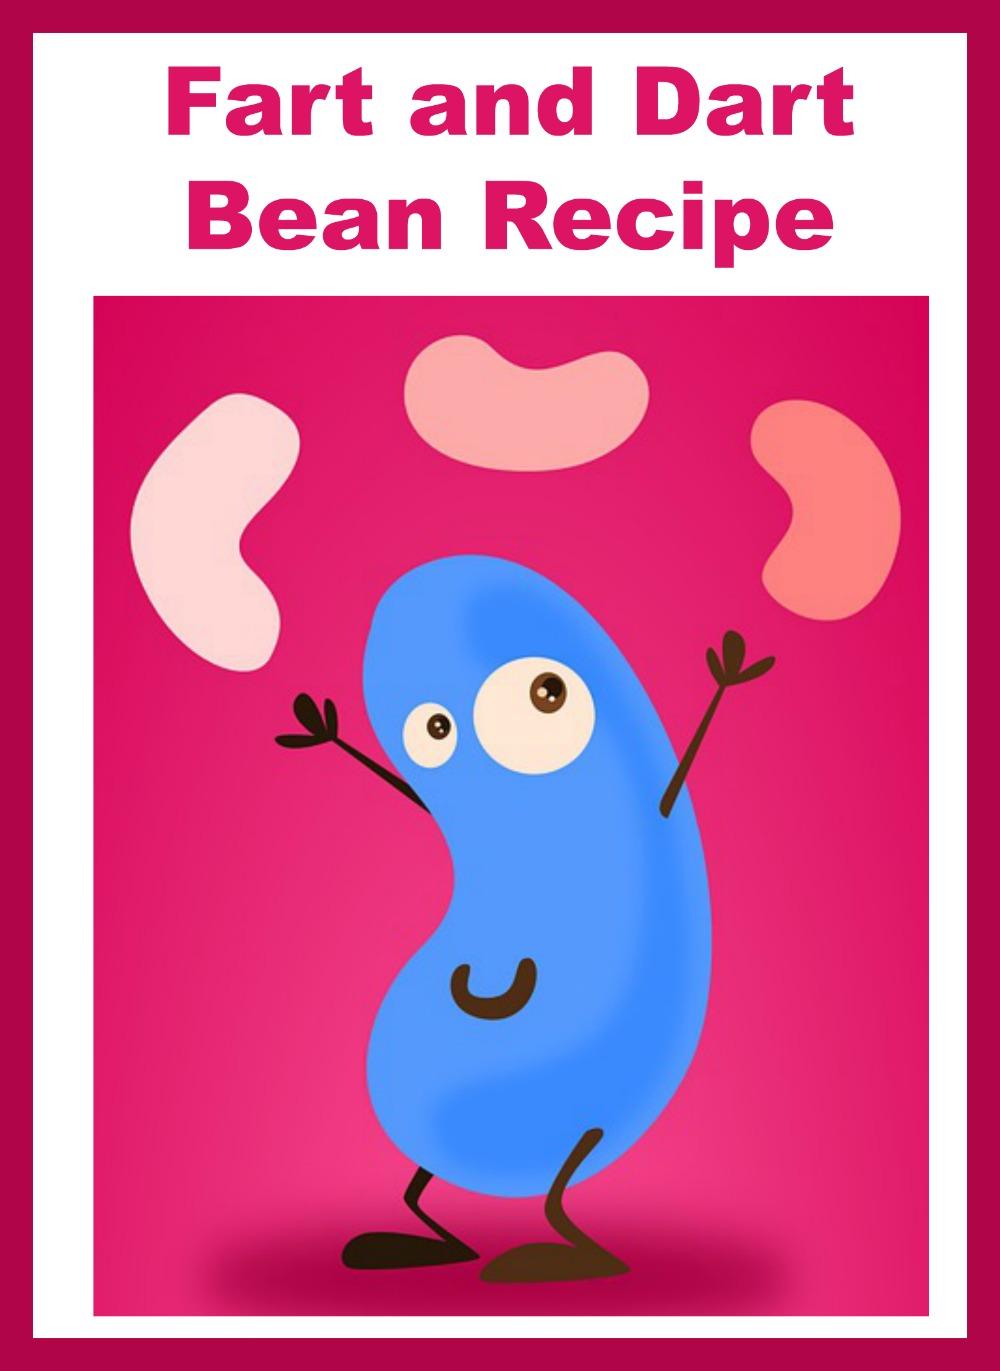 Beans clipart baked bean. Fart and dart recipe